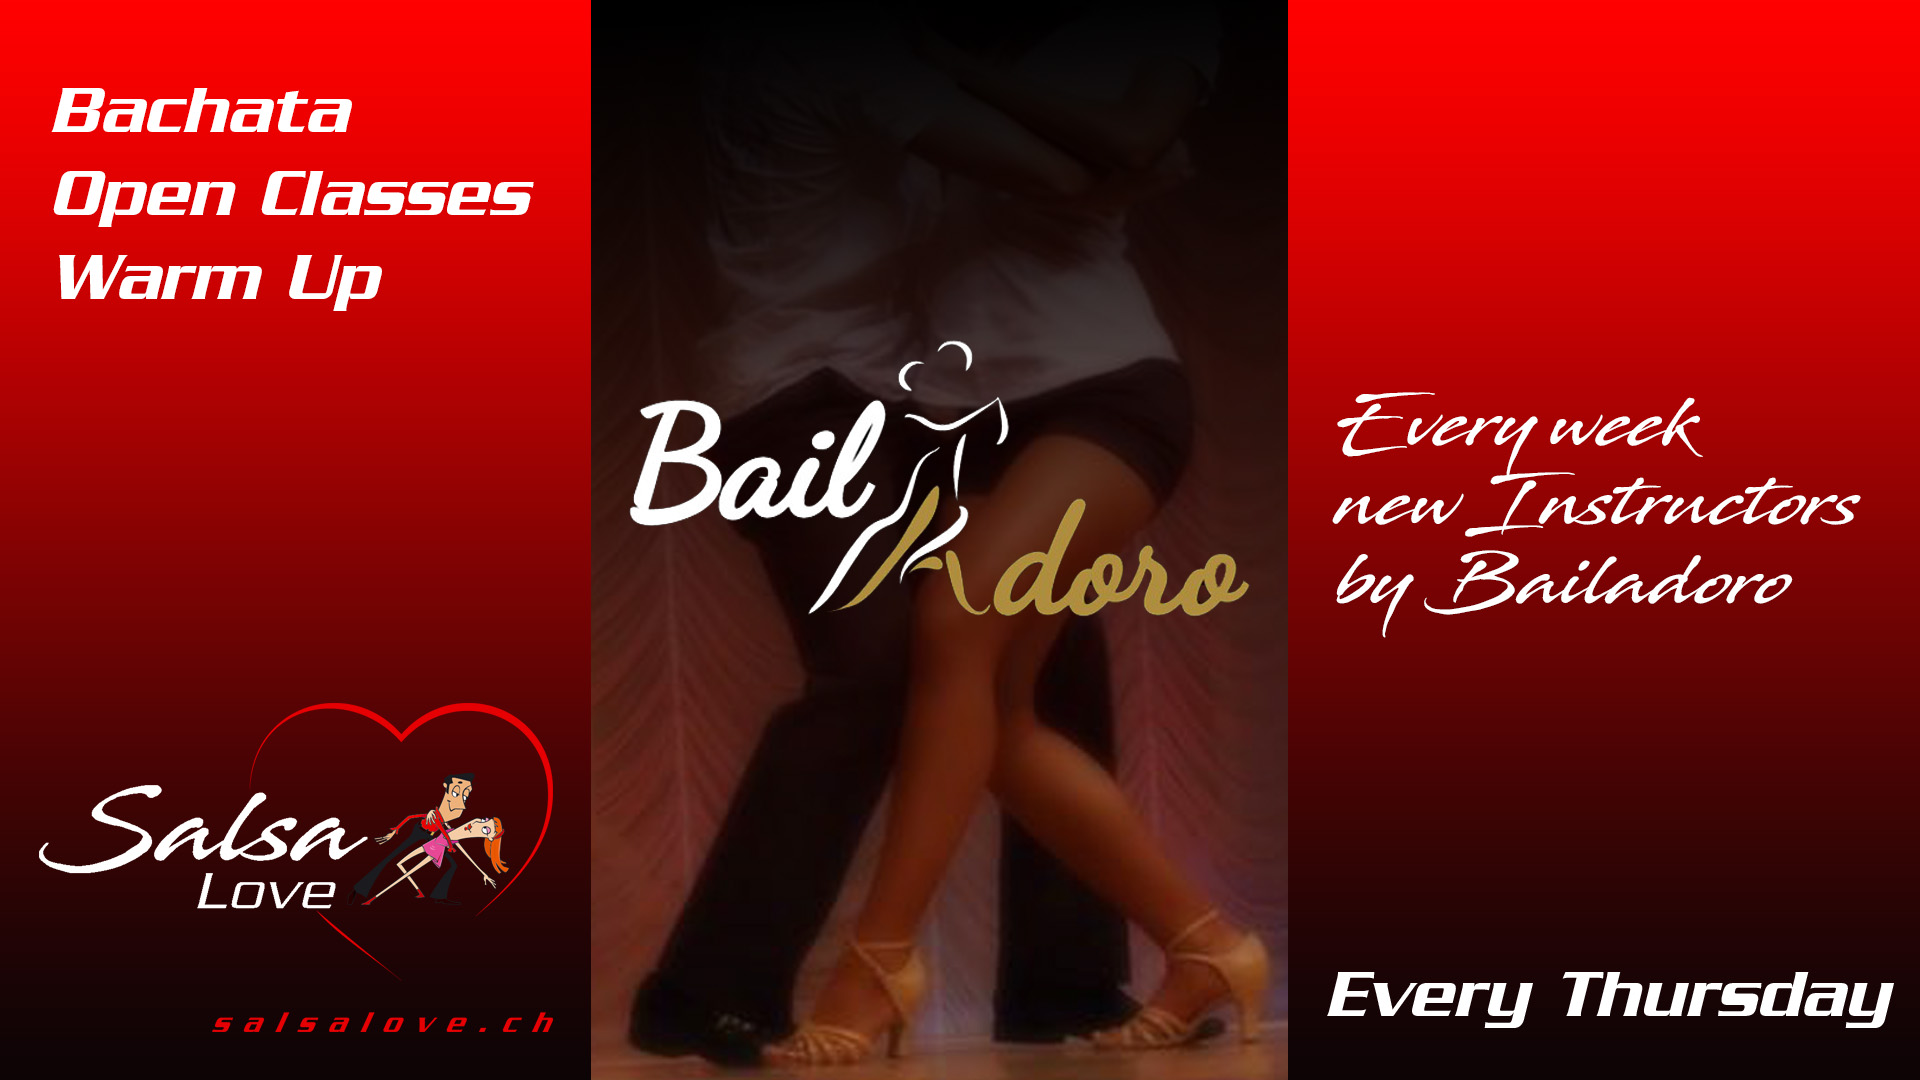 FB_Event_Bachatajpg